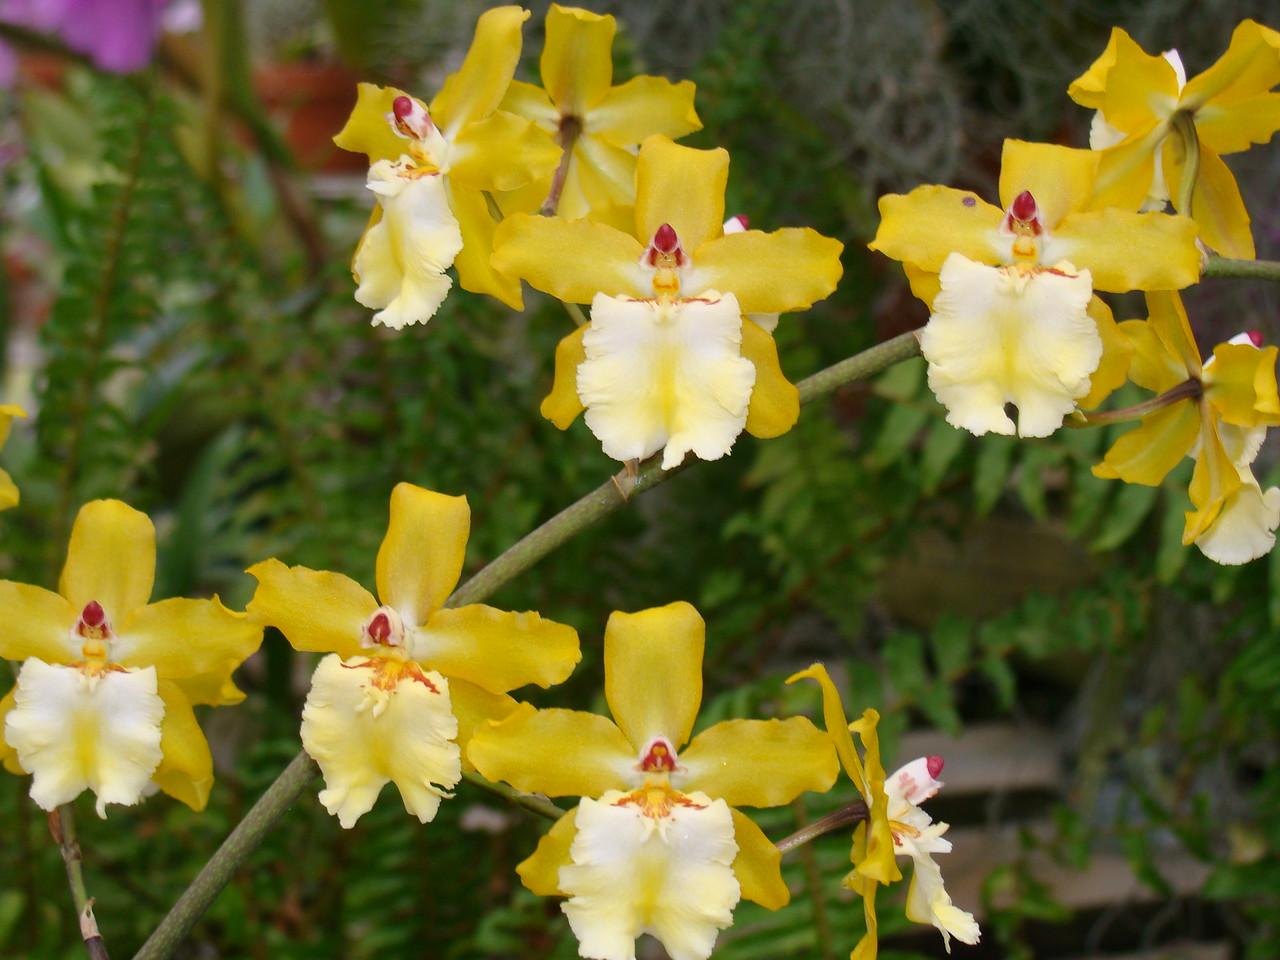 Sunlight Orchids